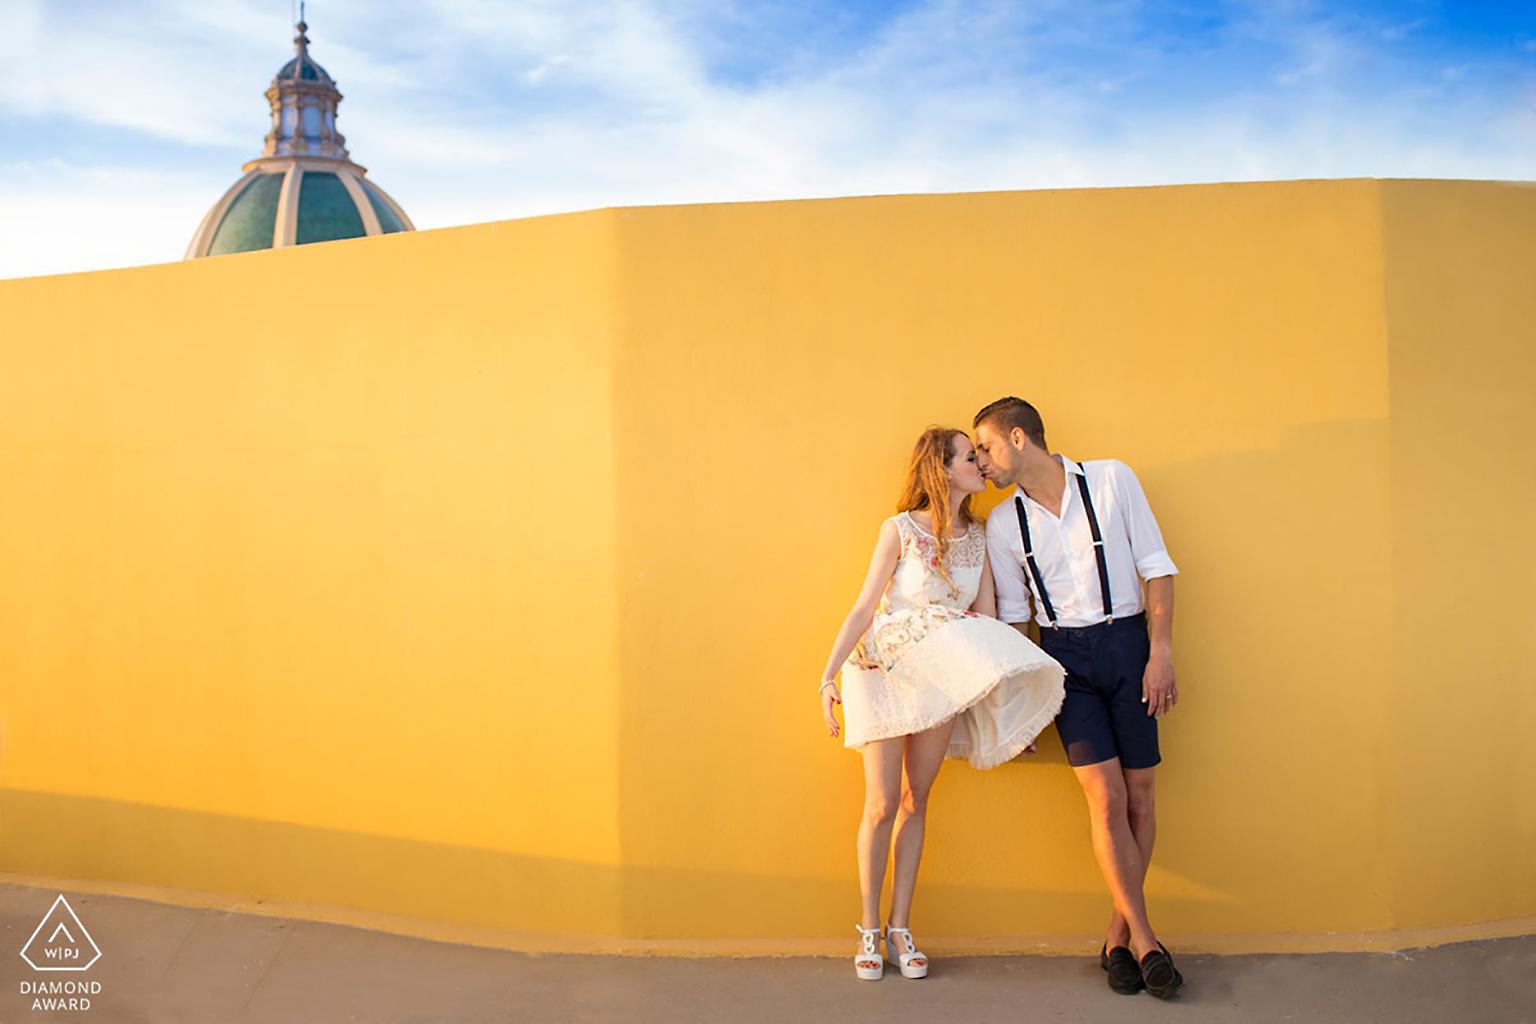 Trapani Fotografo per Matrimoni Nino Lombardo Wedding and Engagement Sicily Photographer